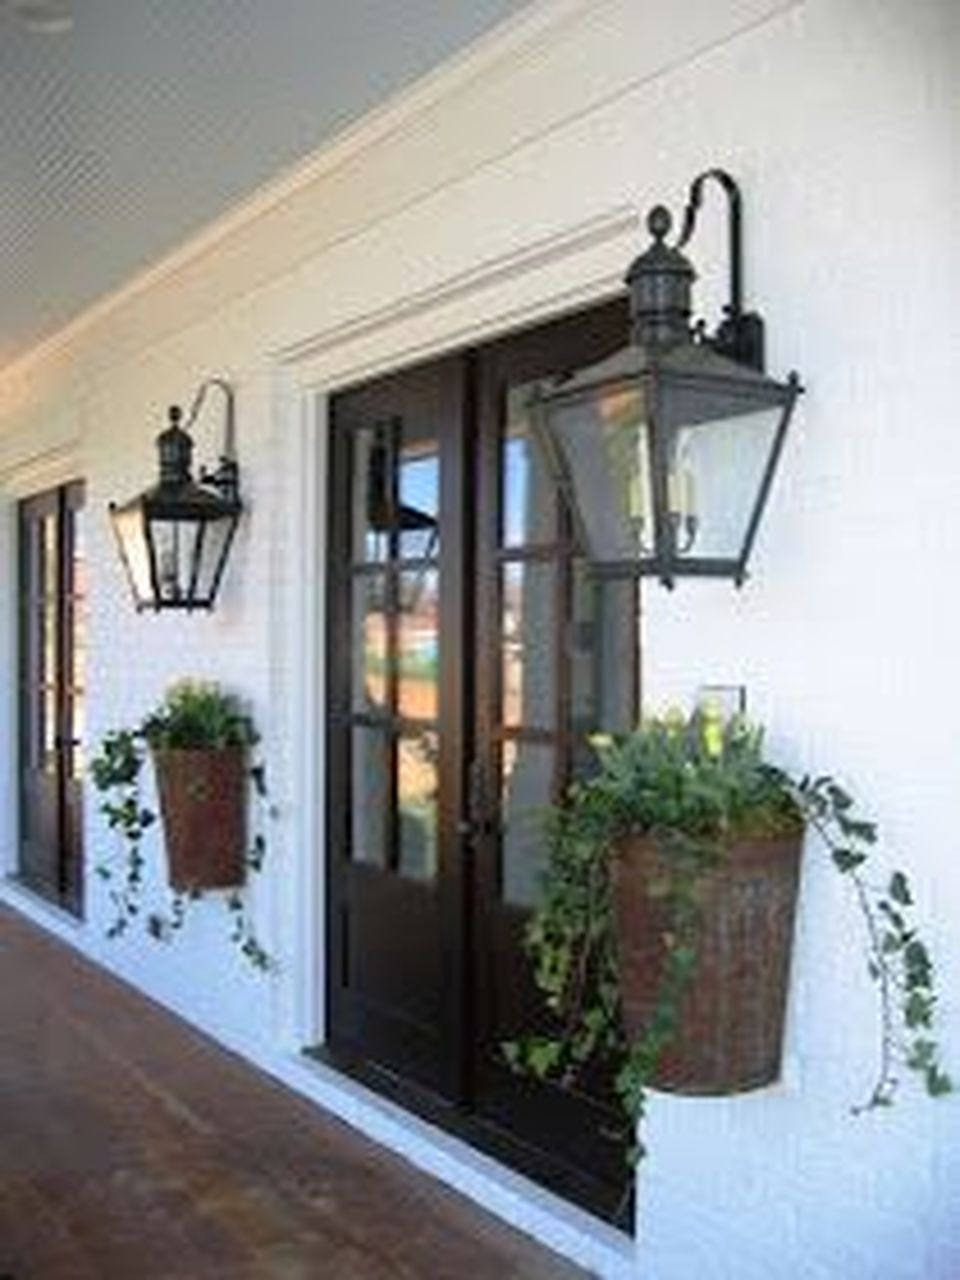 Fascinating Vintage Hanging Gas Lanterns For Front Door Decor